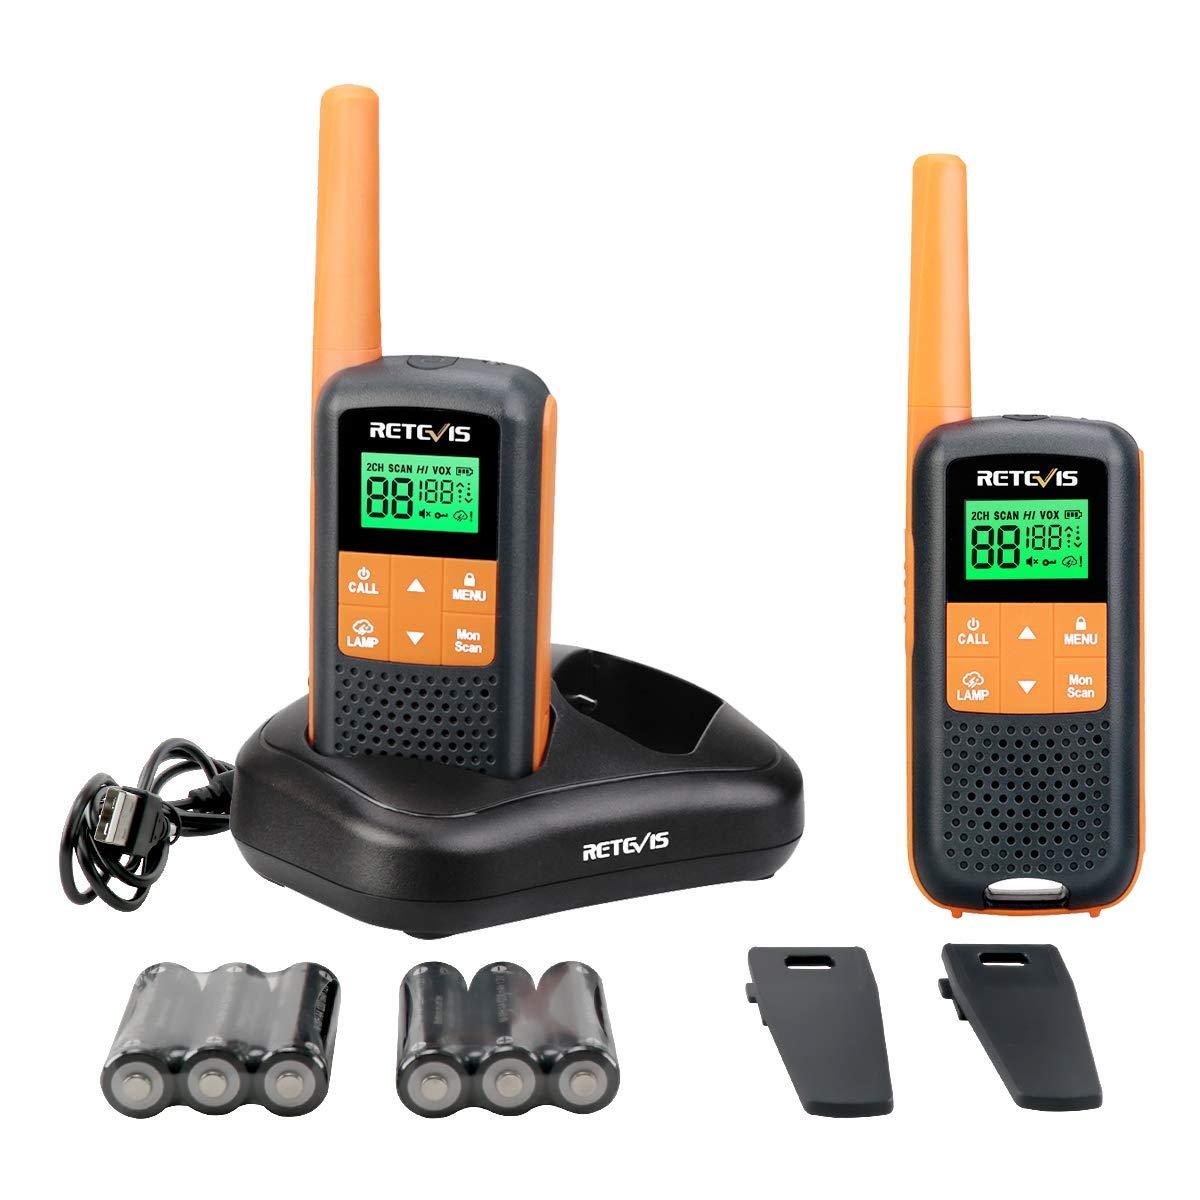 Retevis RT49 Walkie Talkies for Adults Rechargeable FRS NOAA Weather Alert LCD AA Battery Flashlight Dual Watch VOX Waterproof Two-Way Radios(2 Pack)